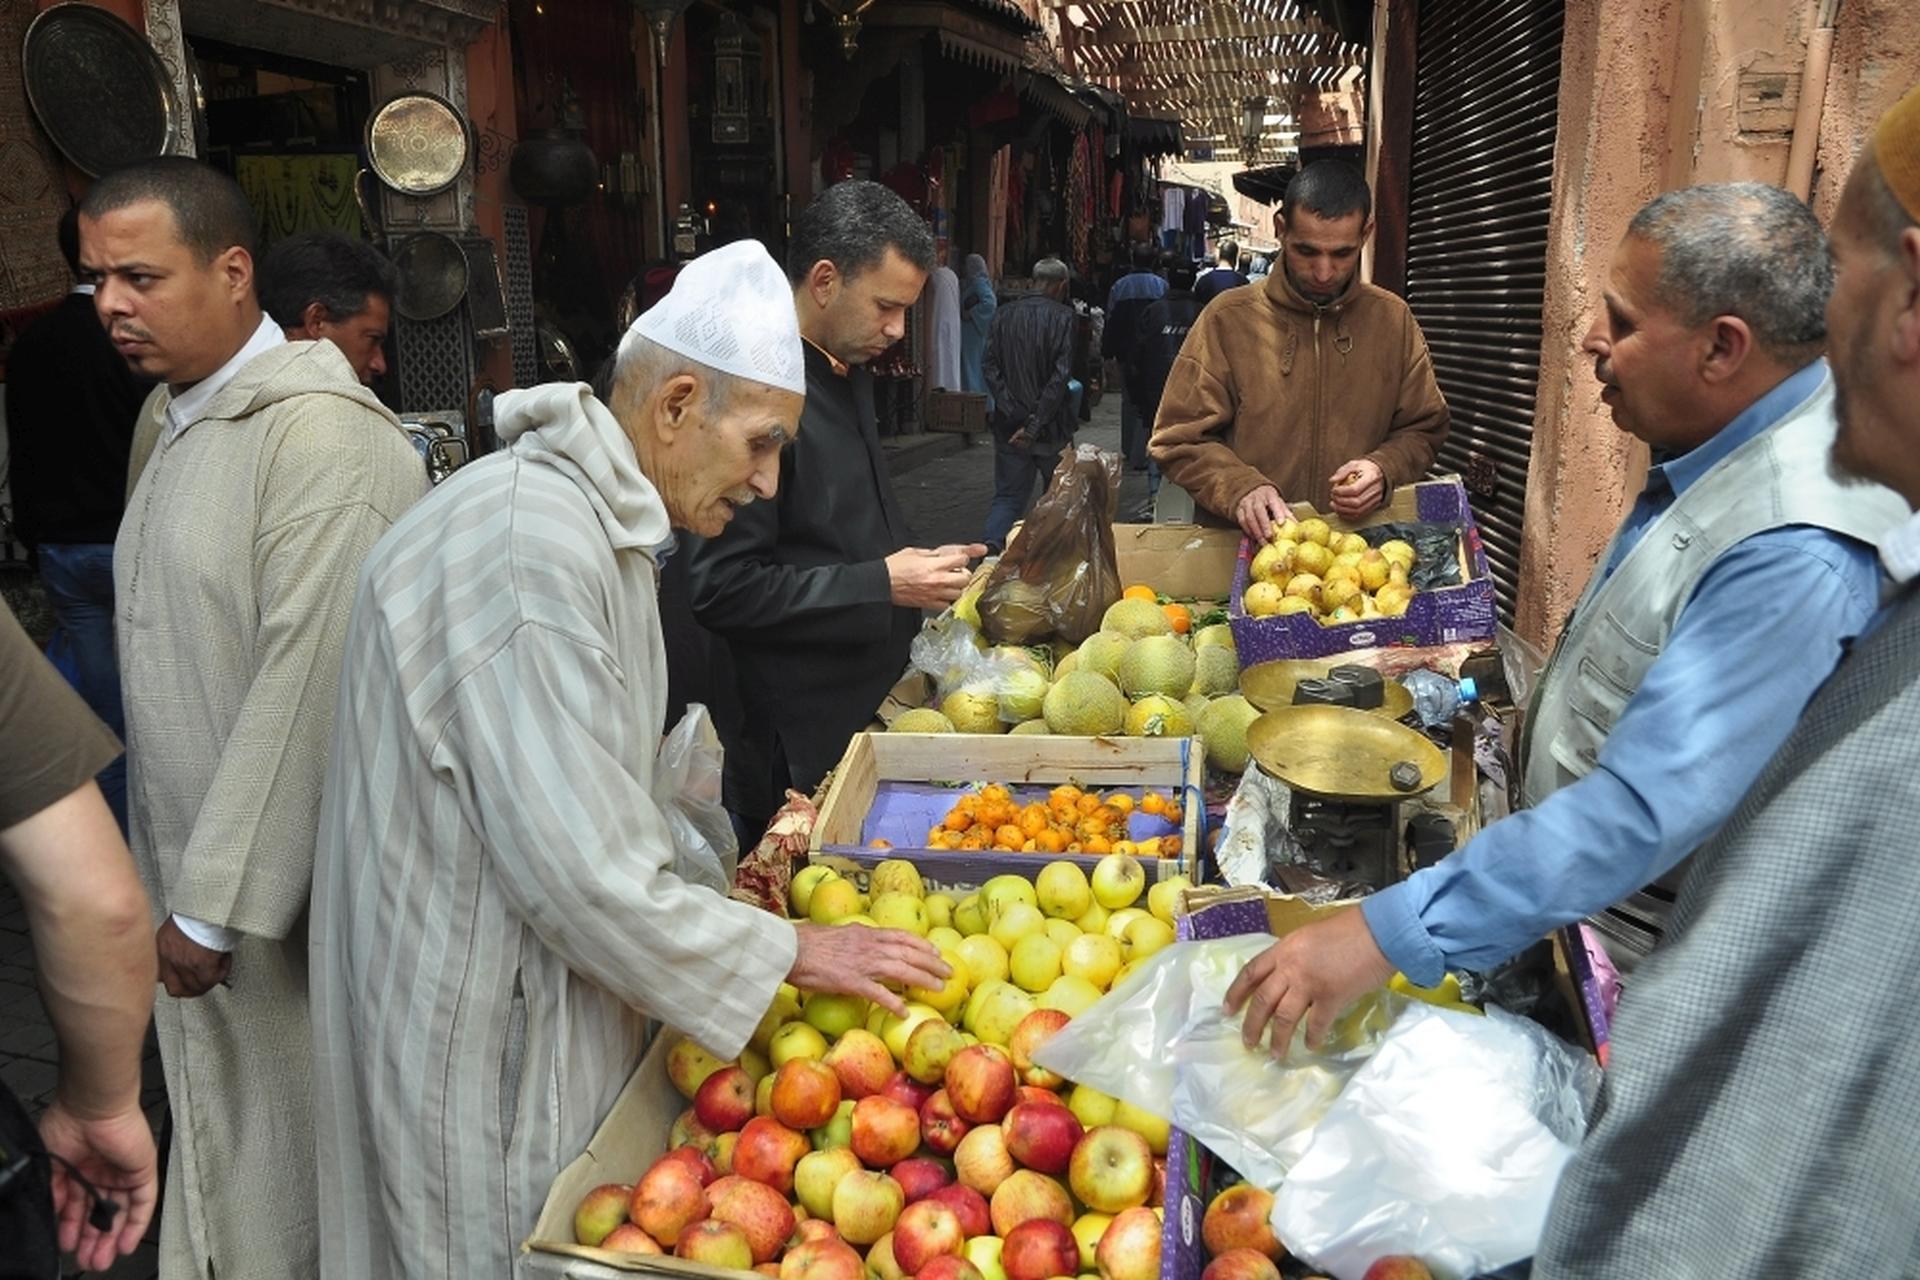 2013-10-marokko_munding-diashows_030